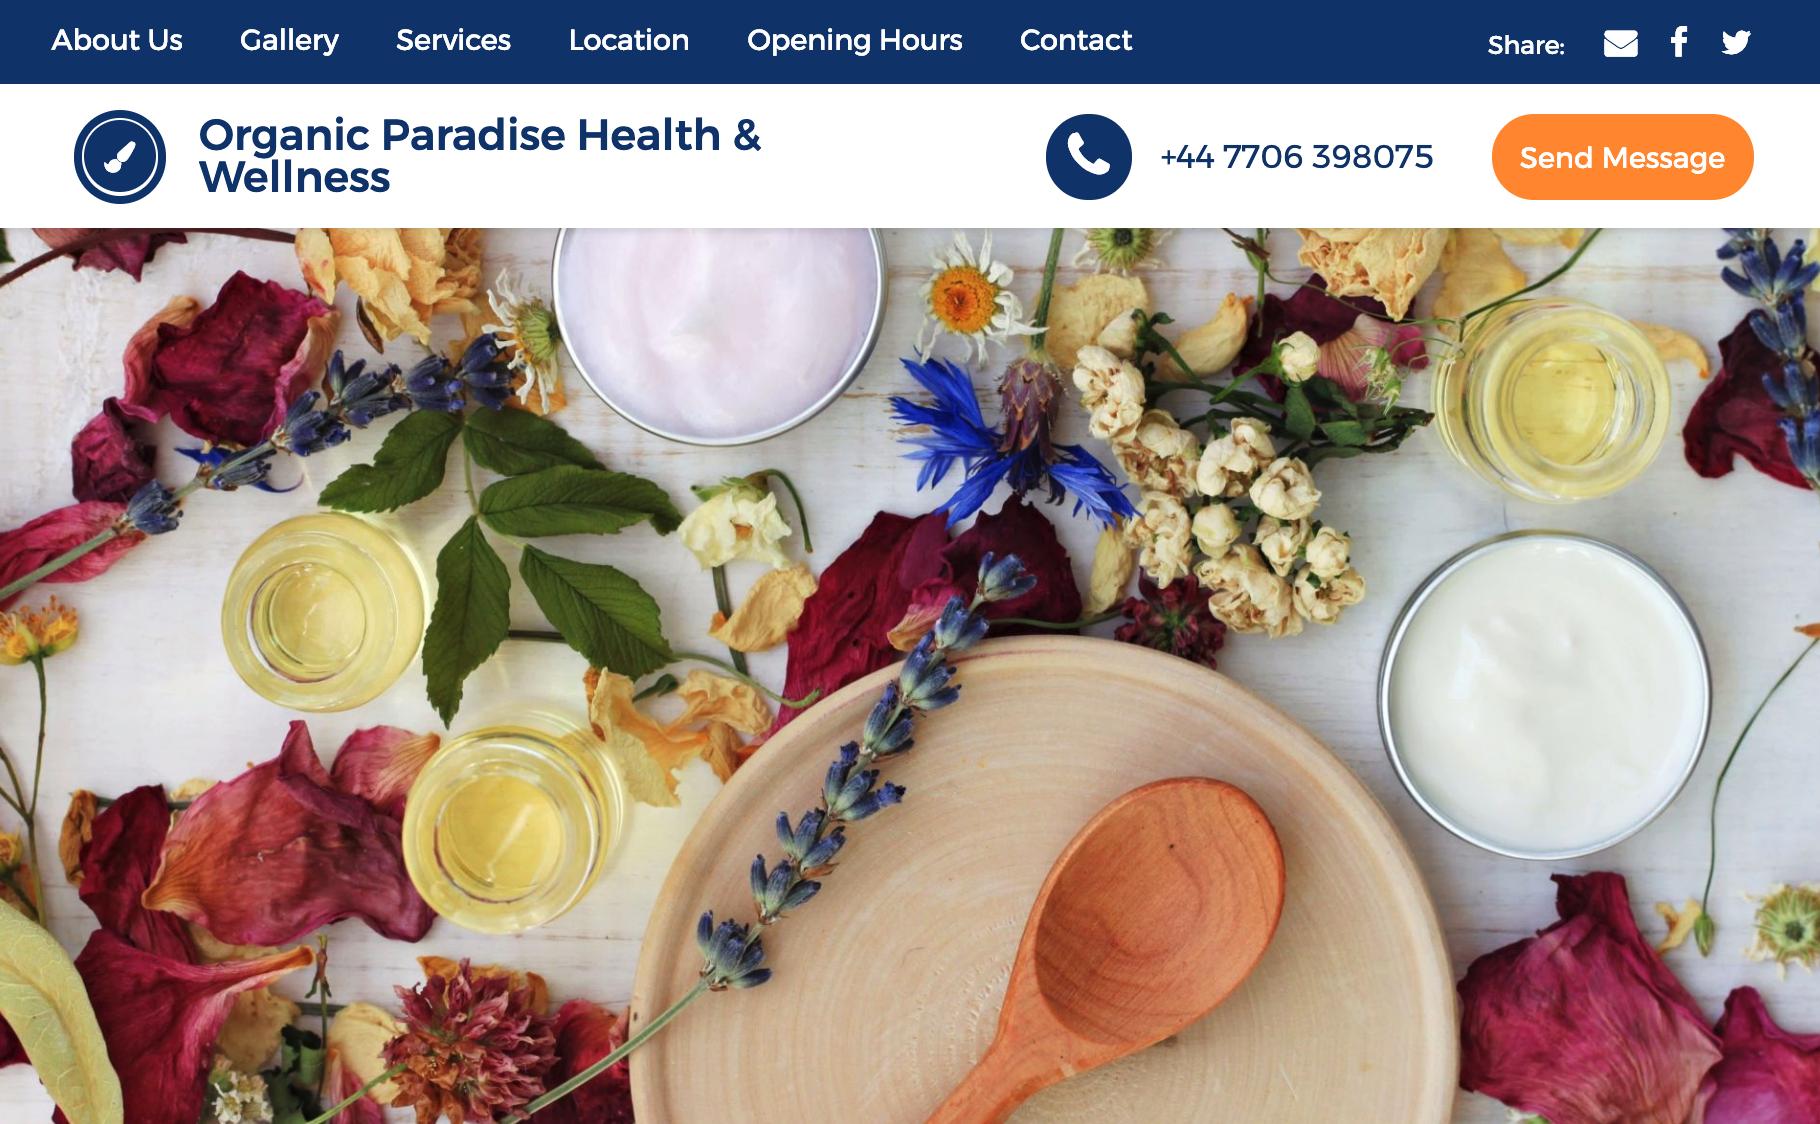 Organic Paradise Health & Wellness